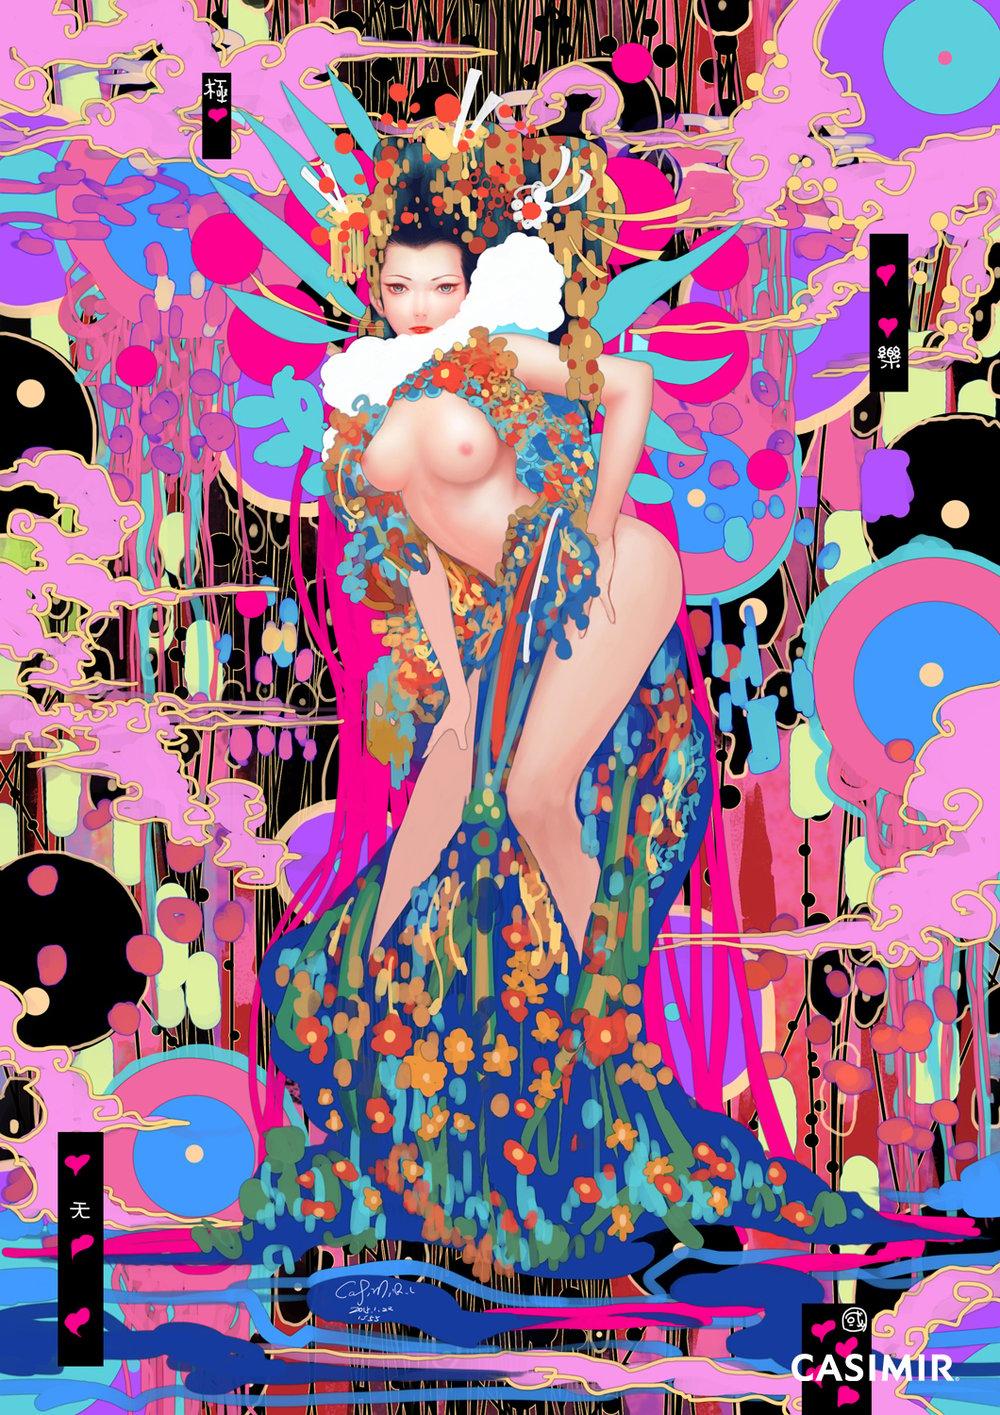 CASIMIR ART Limited Print - Elysium Heaven  / 極樂天國 限量版畫